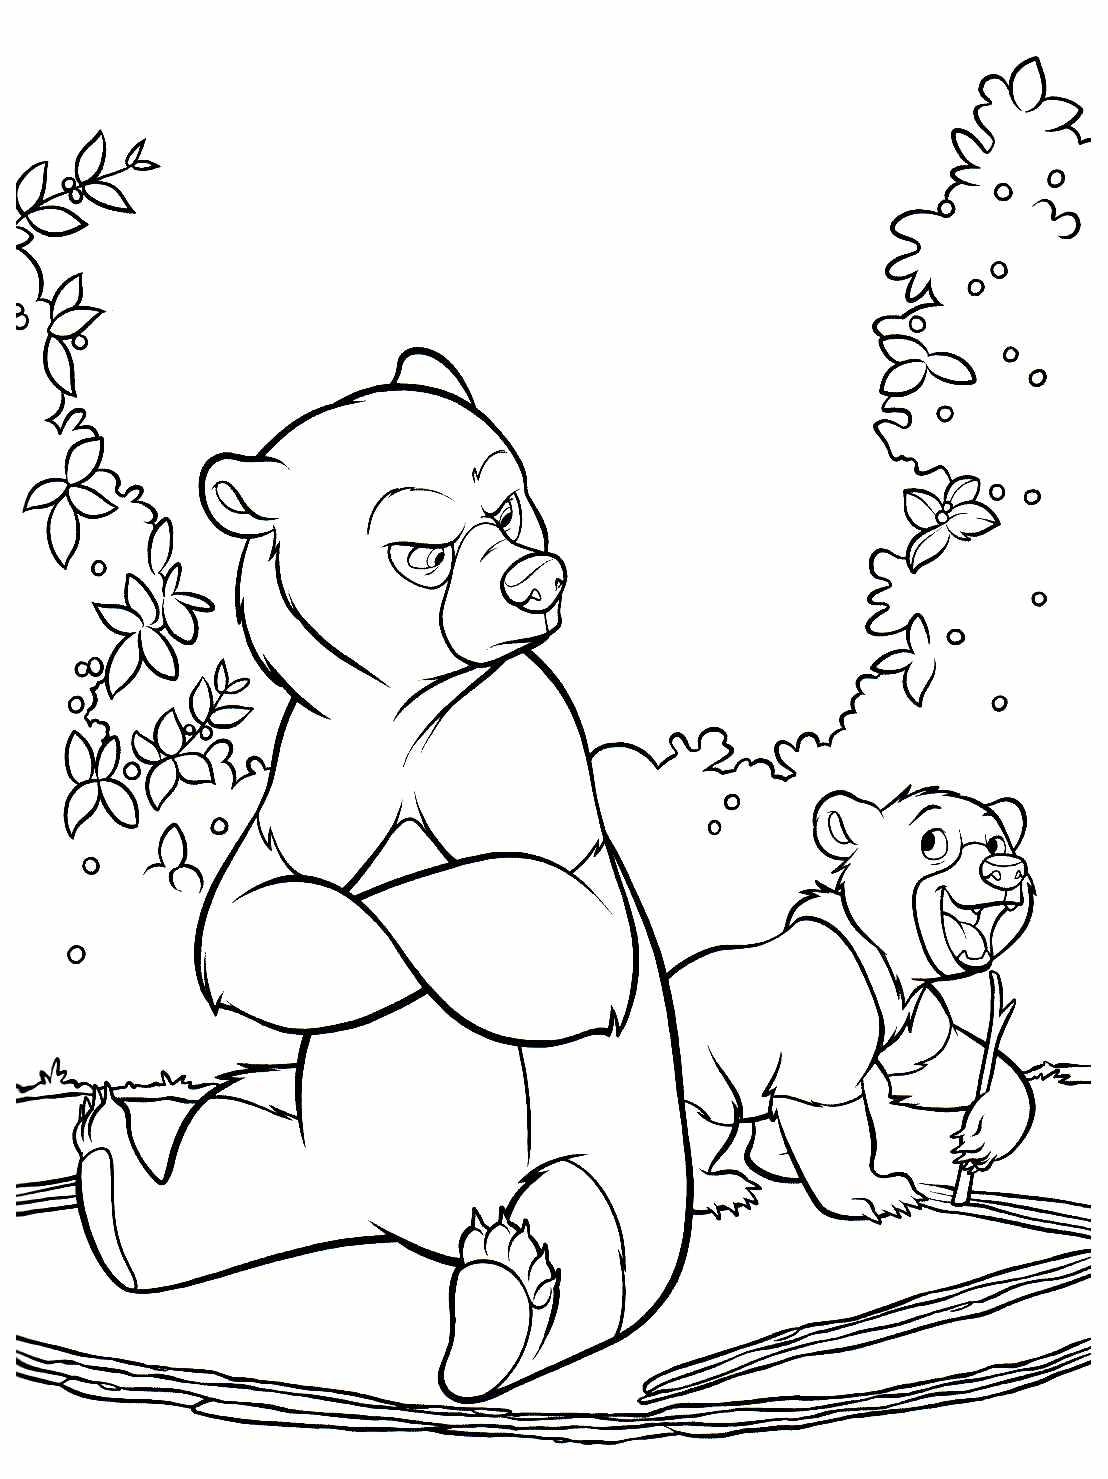 dessin � colorier � imprimer frere des ours